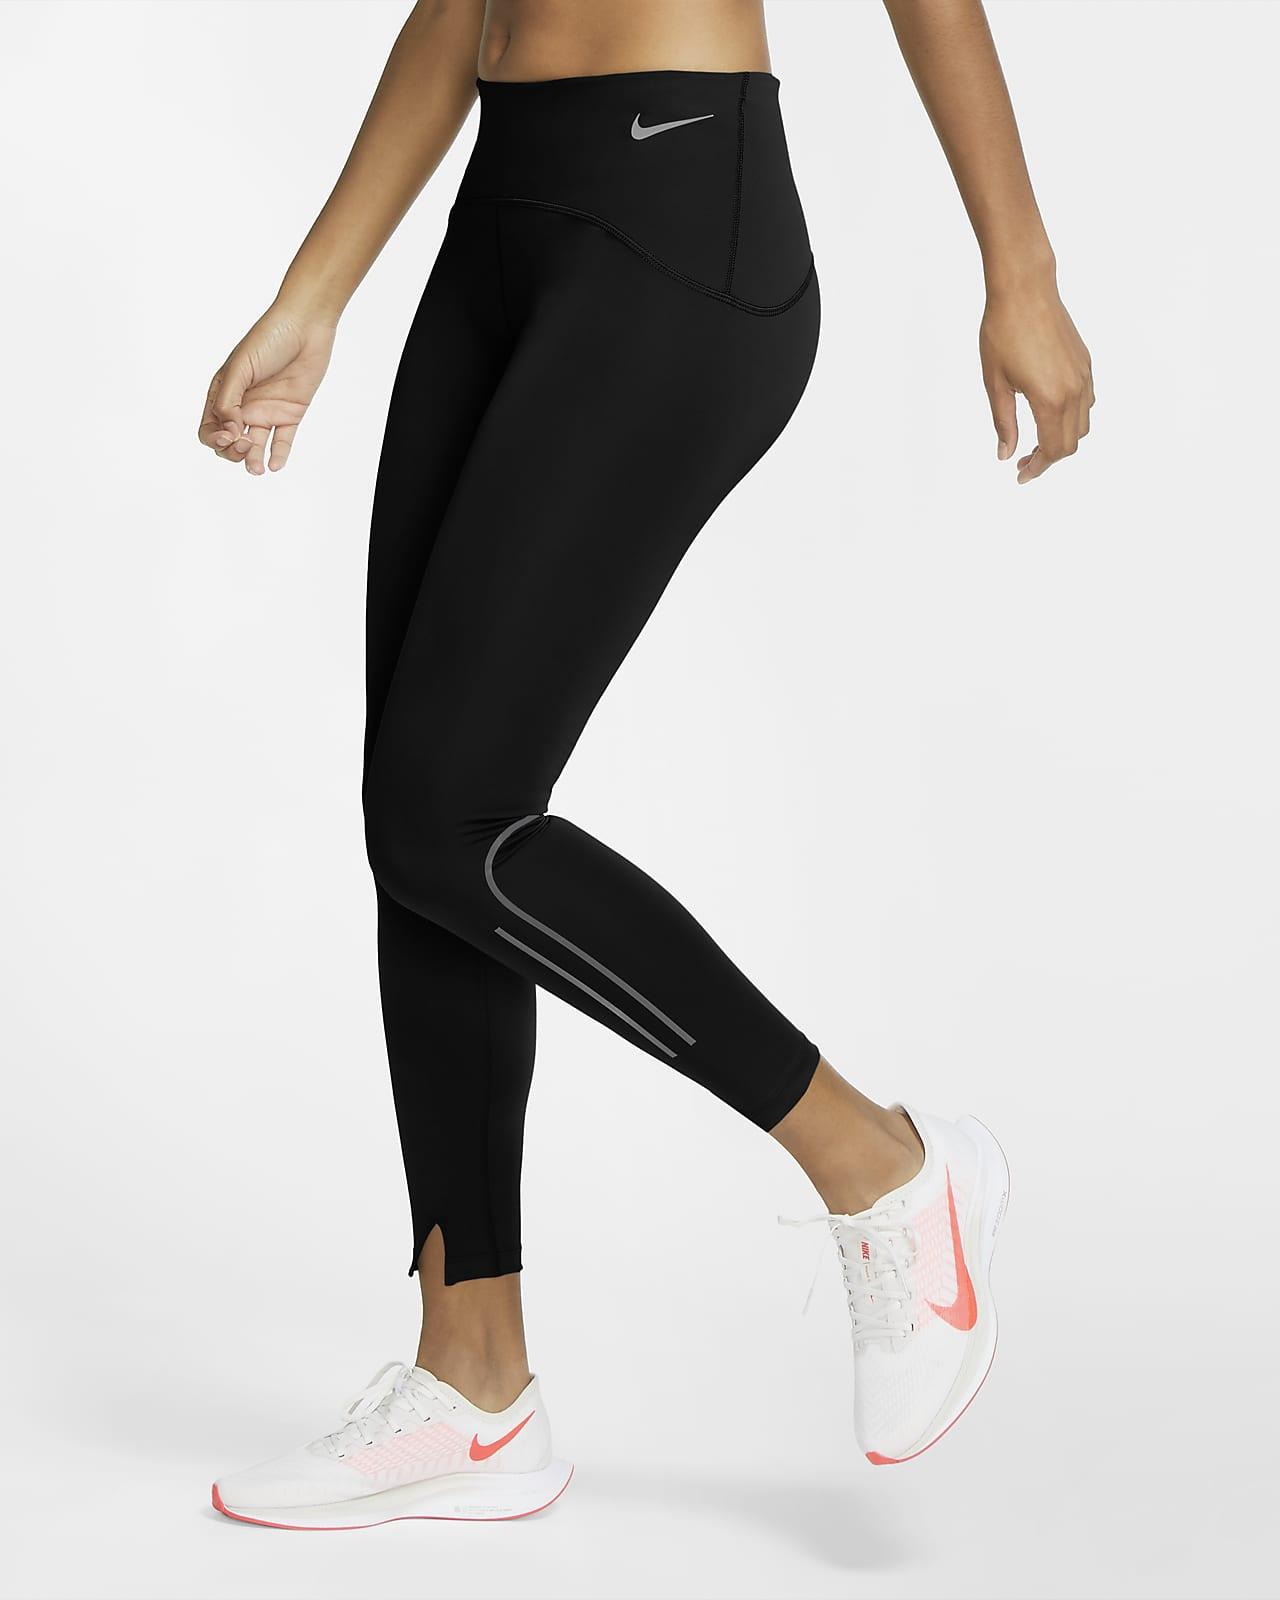 Legging de running mat 7/8 Nike Speed pour Femme